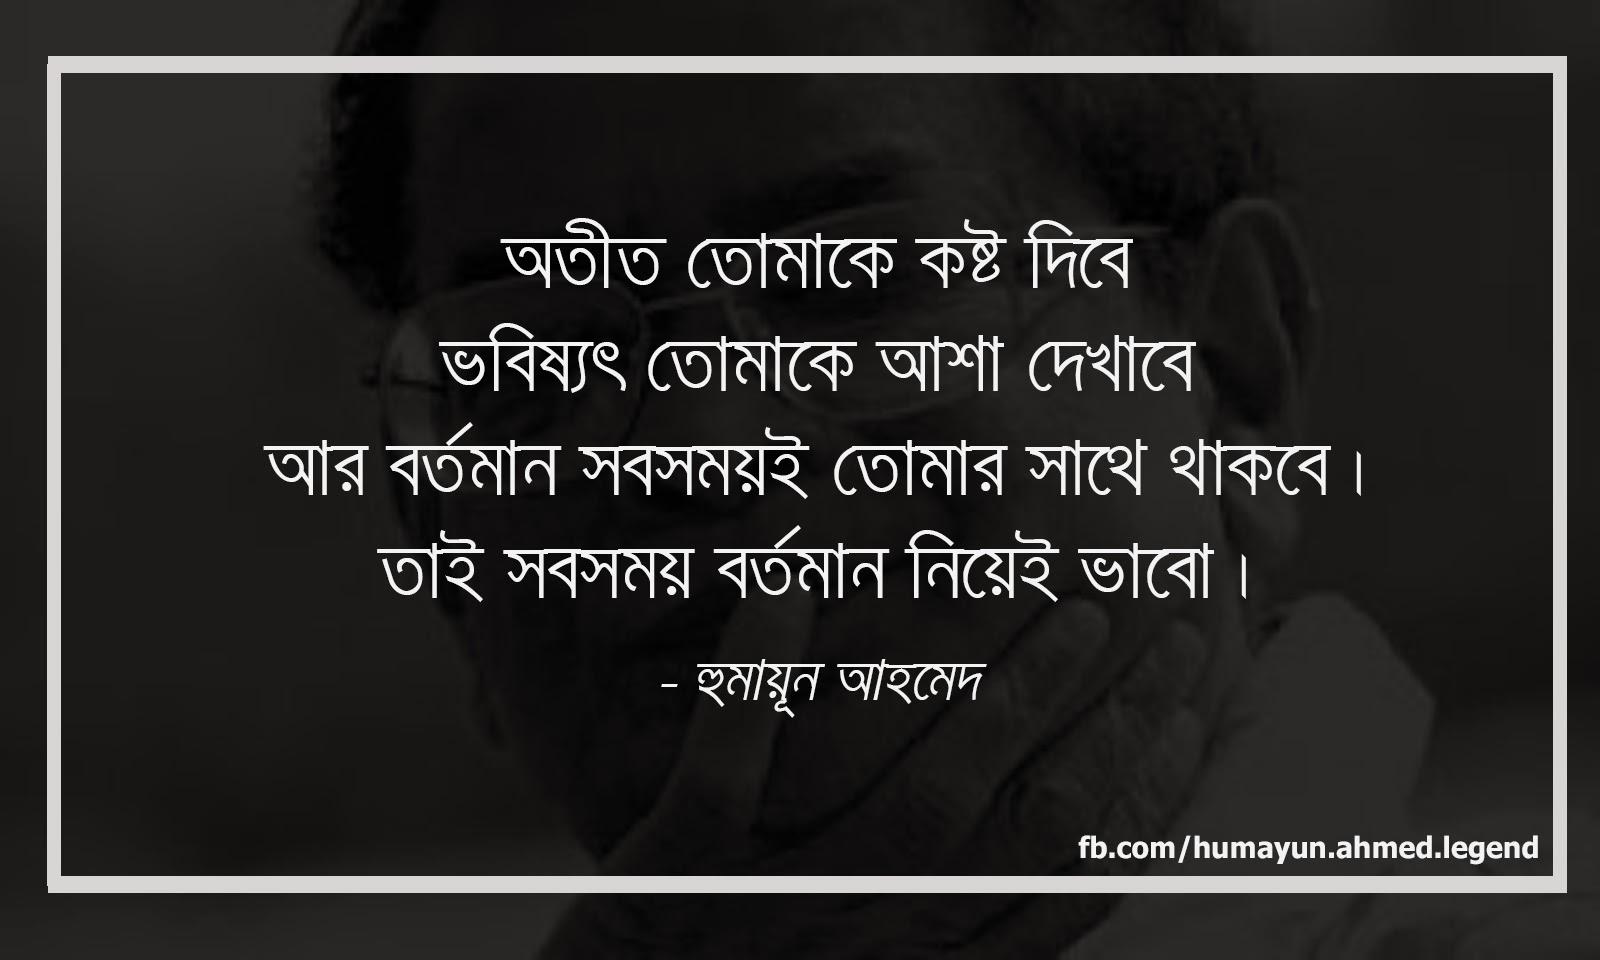 humayun ahmed quotes in bangla quotesgram